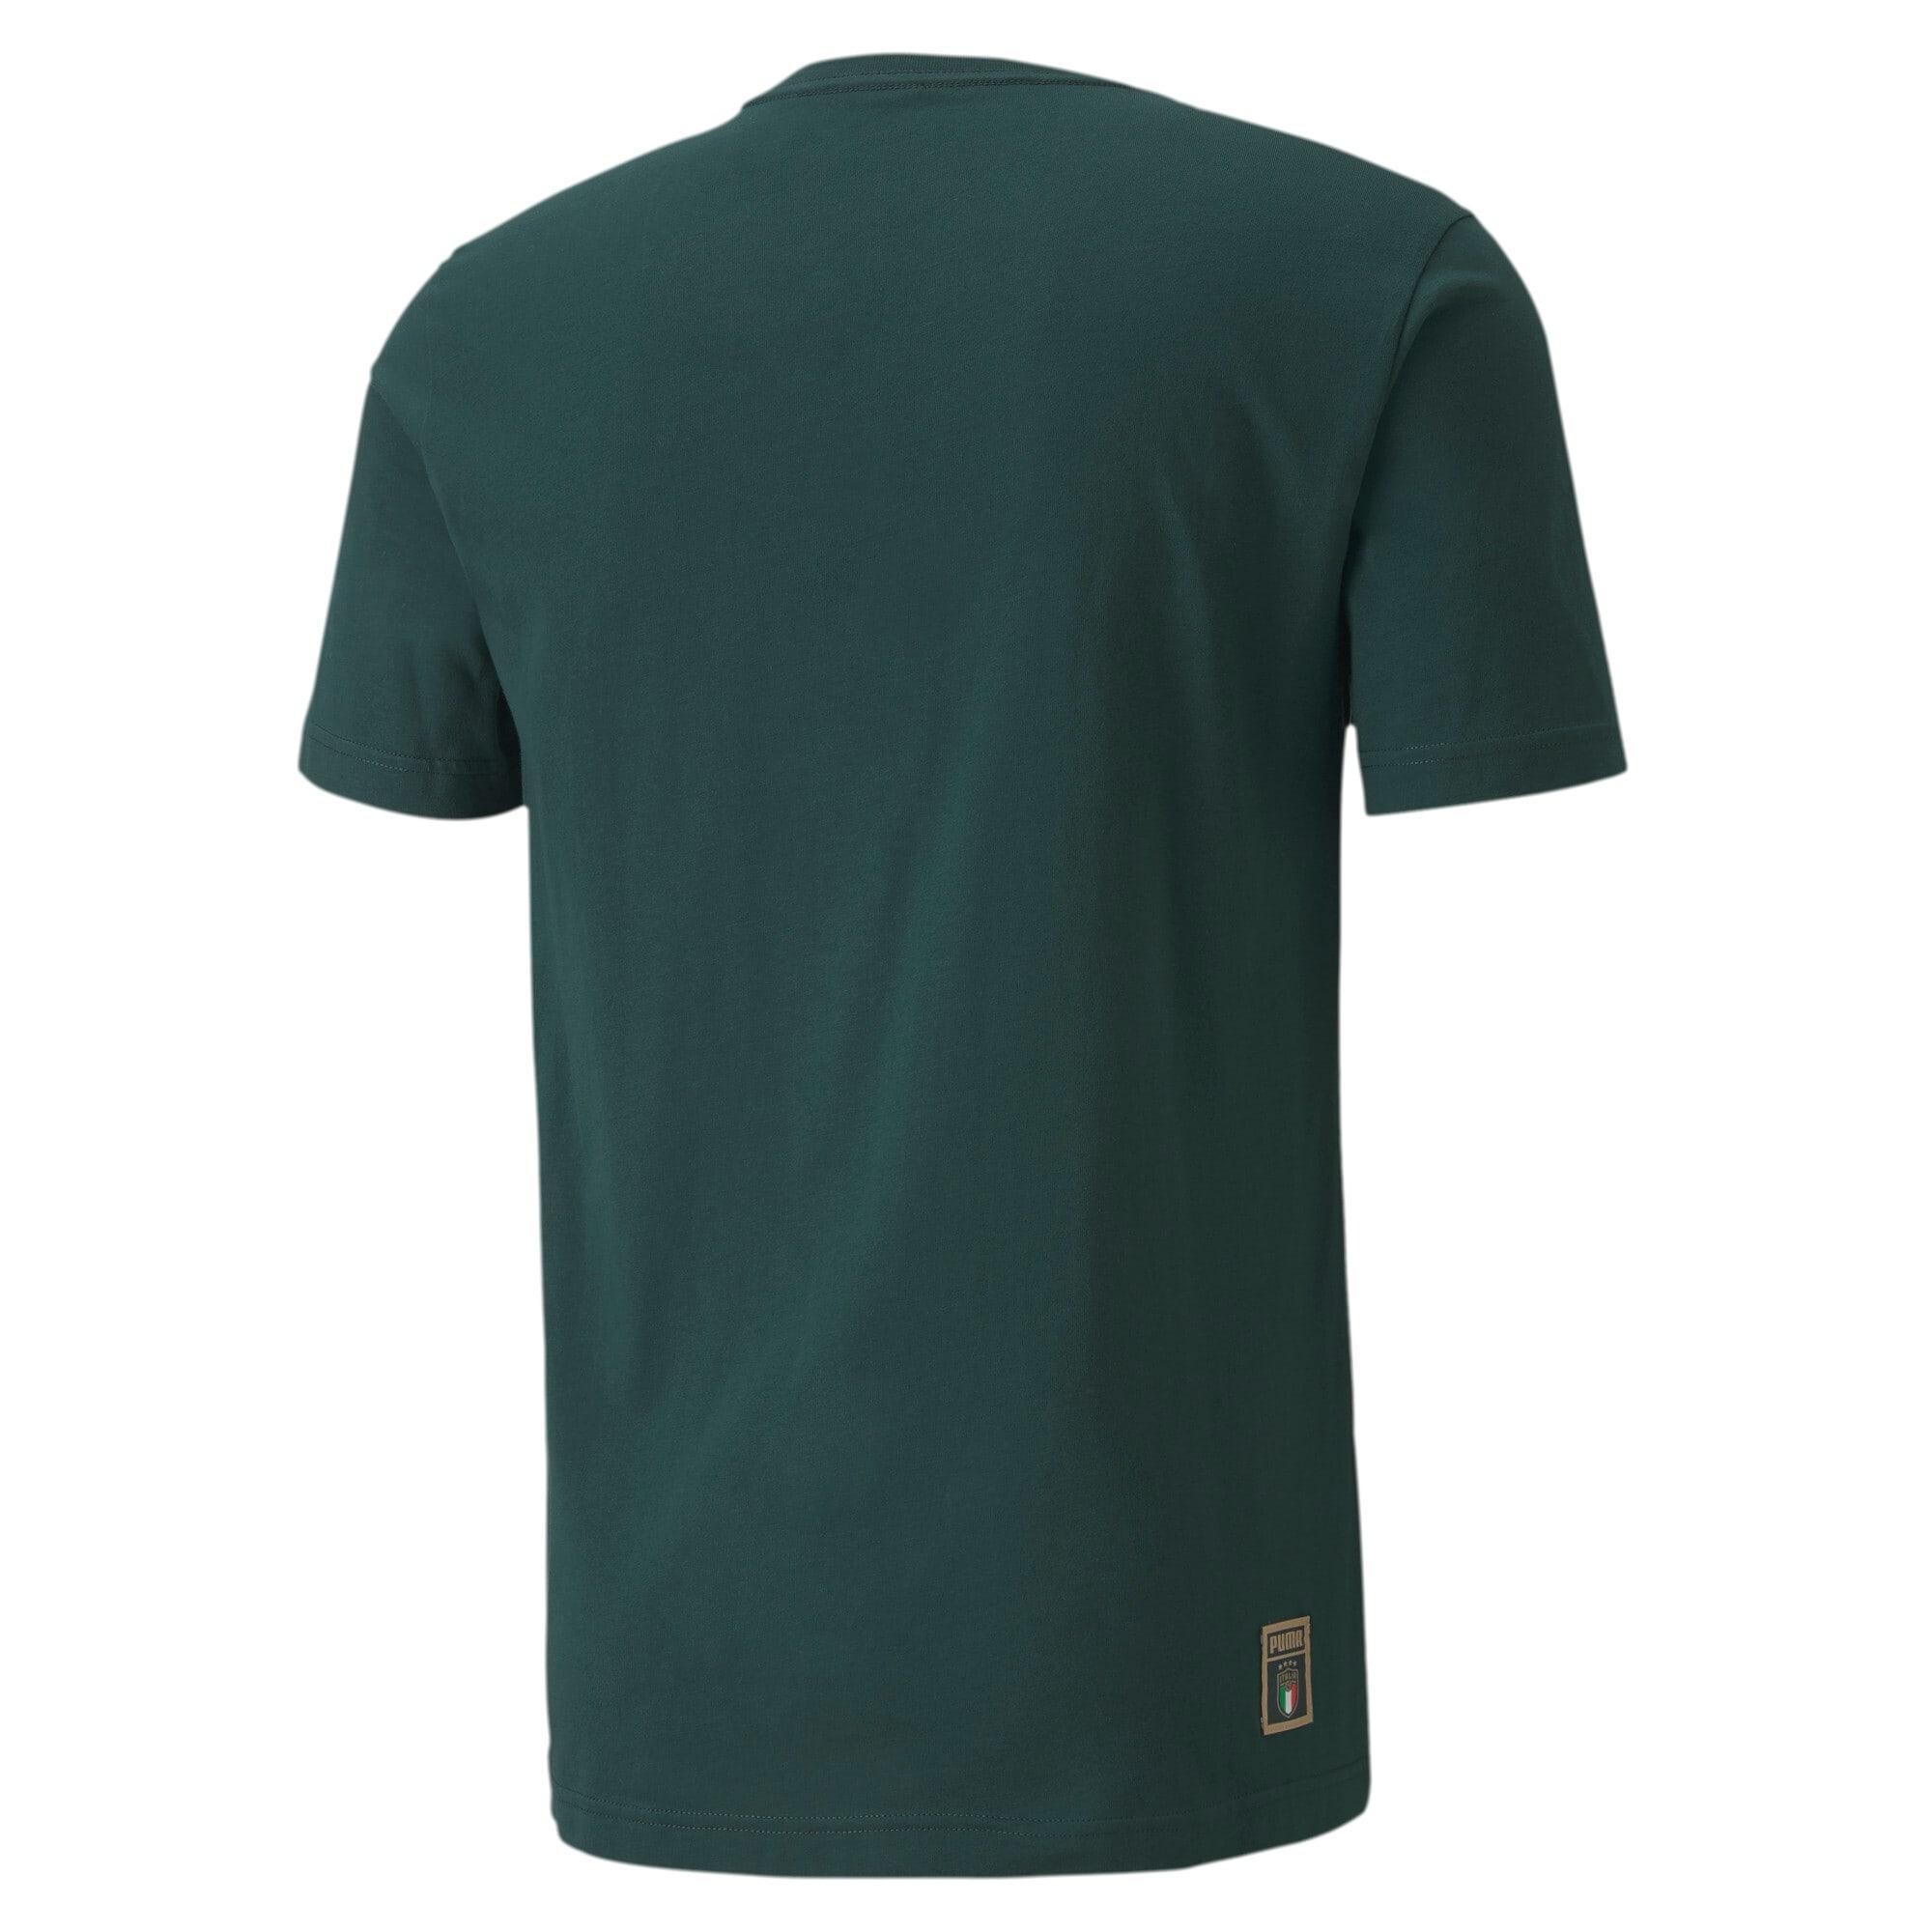 Thumbnail 3 of FIGC イタリア PUMA DNA Tシャツ 半袖, Ponderosa Pine-Team gold, medium-JPN